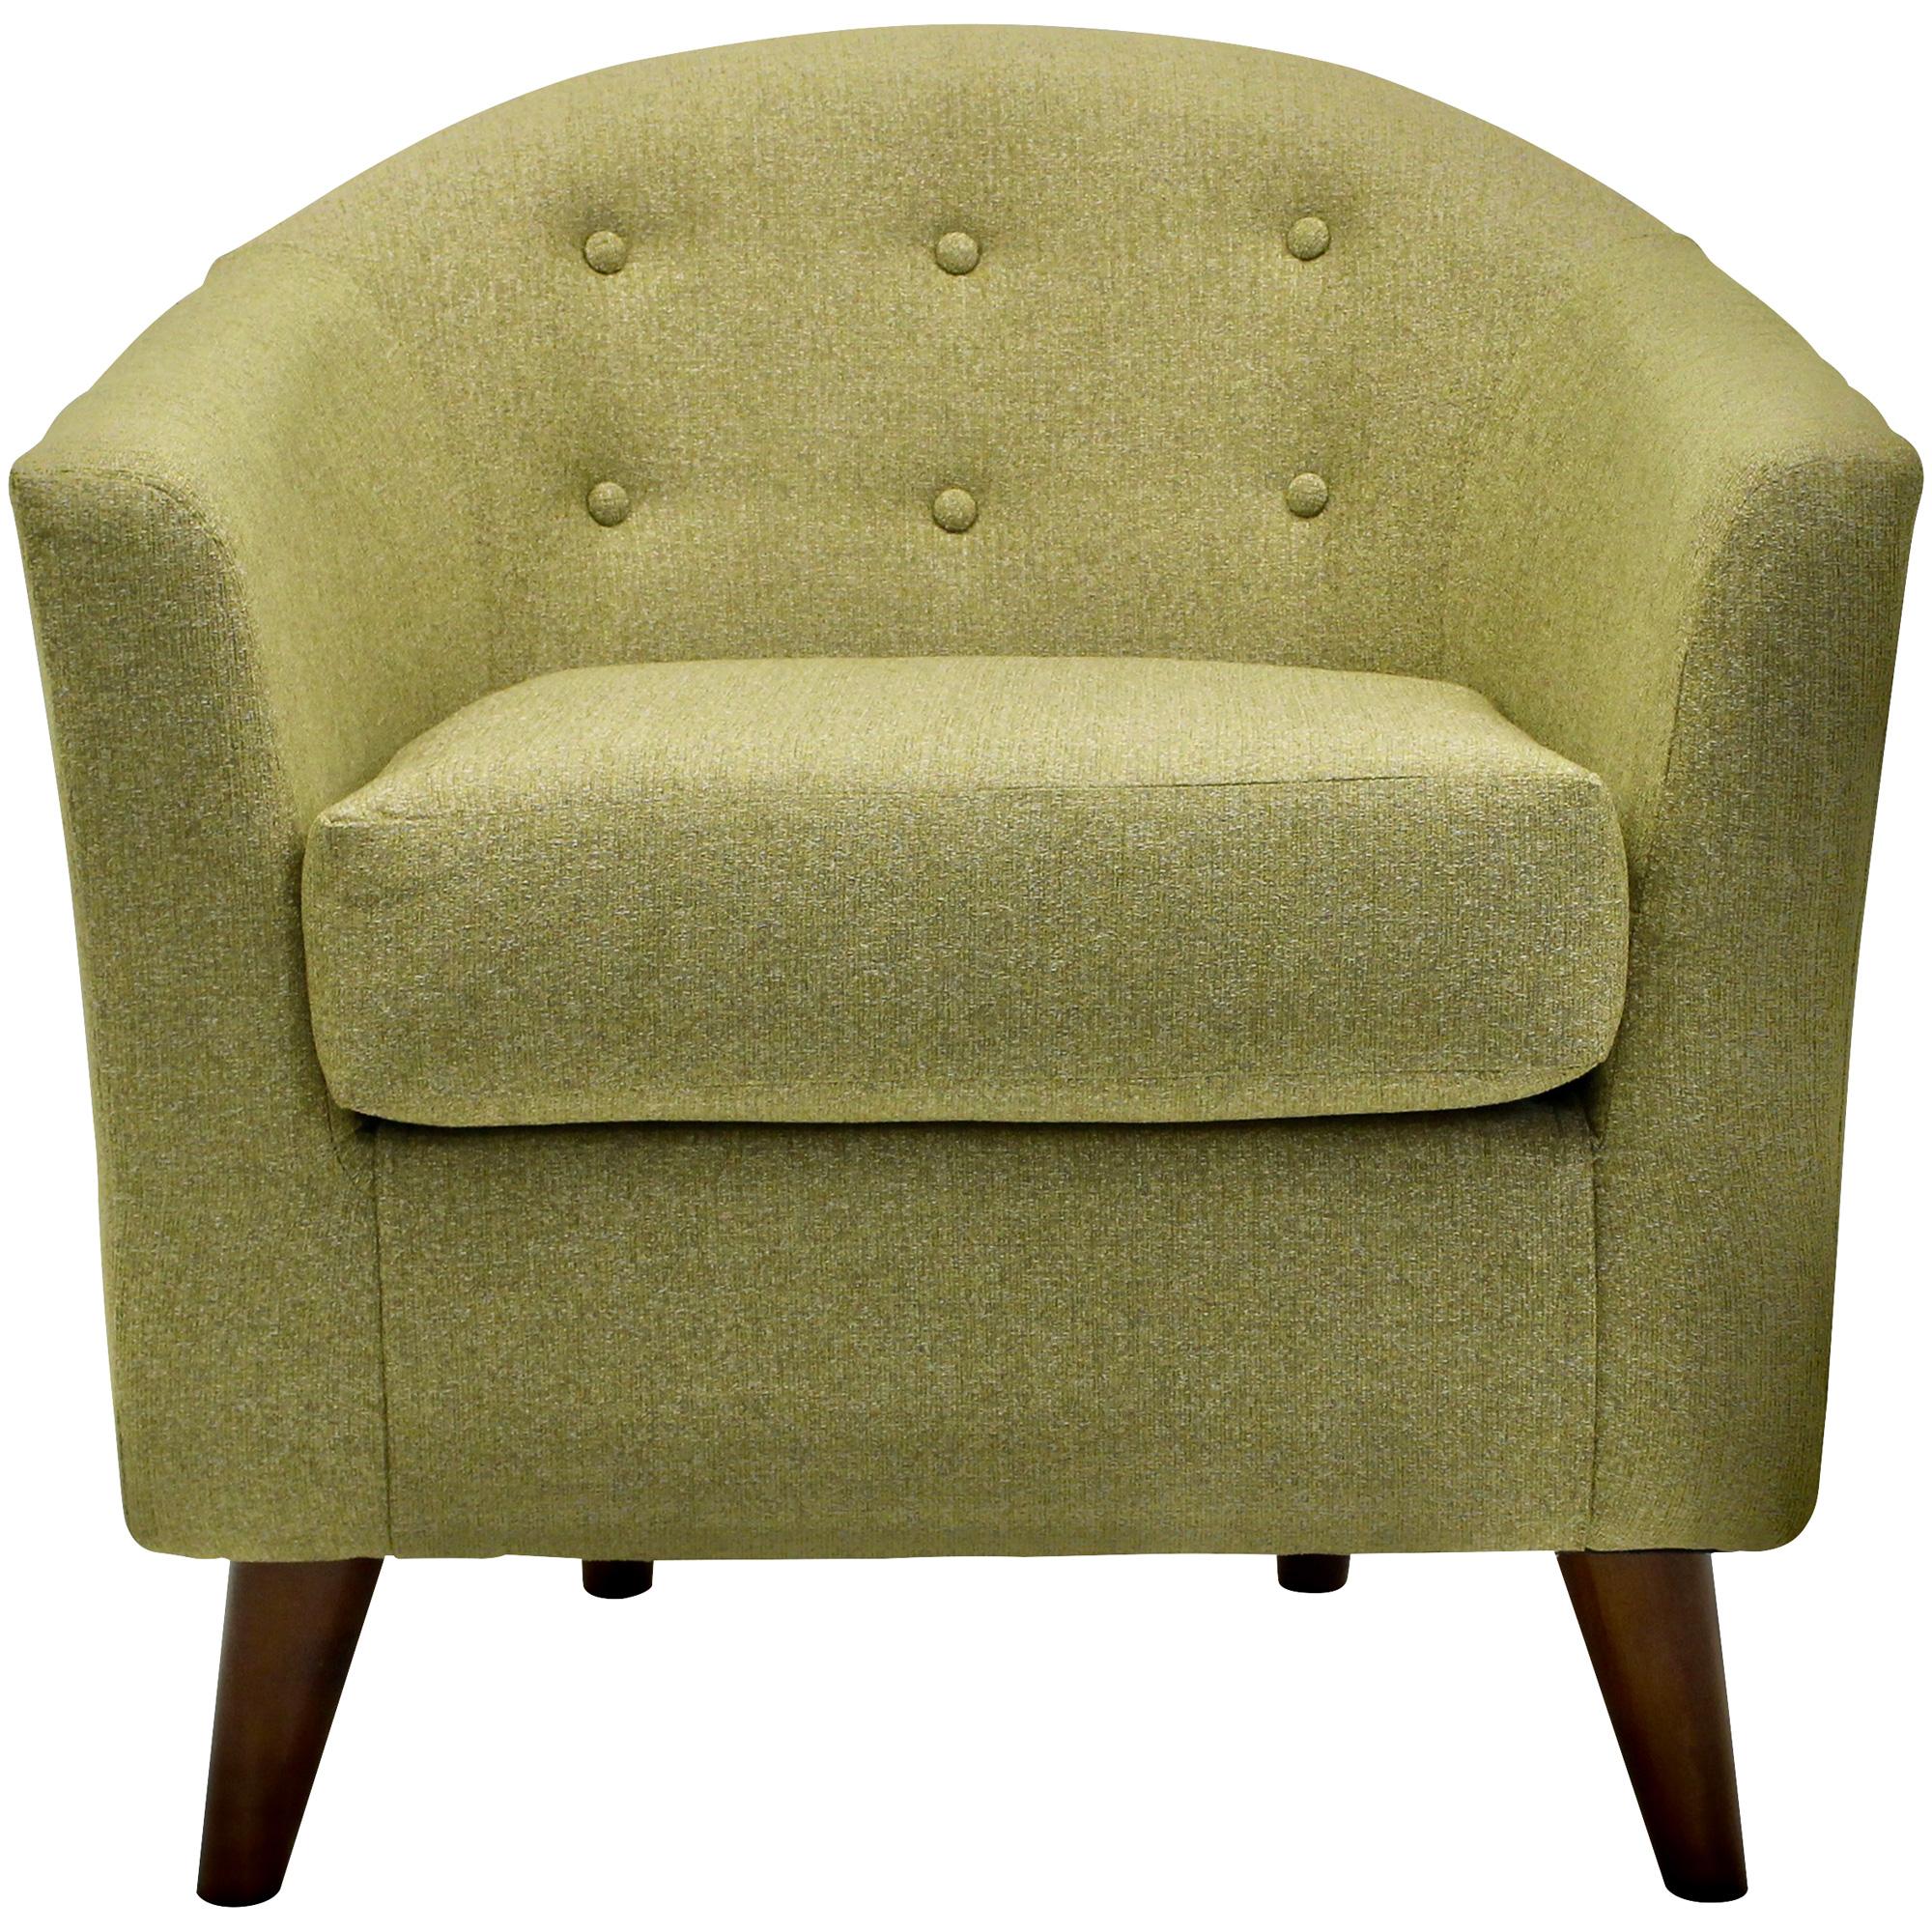 Overman | Marissa Citron Accent Chair